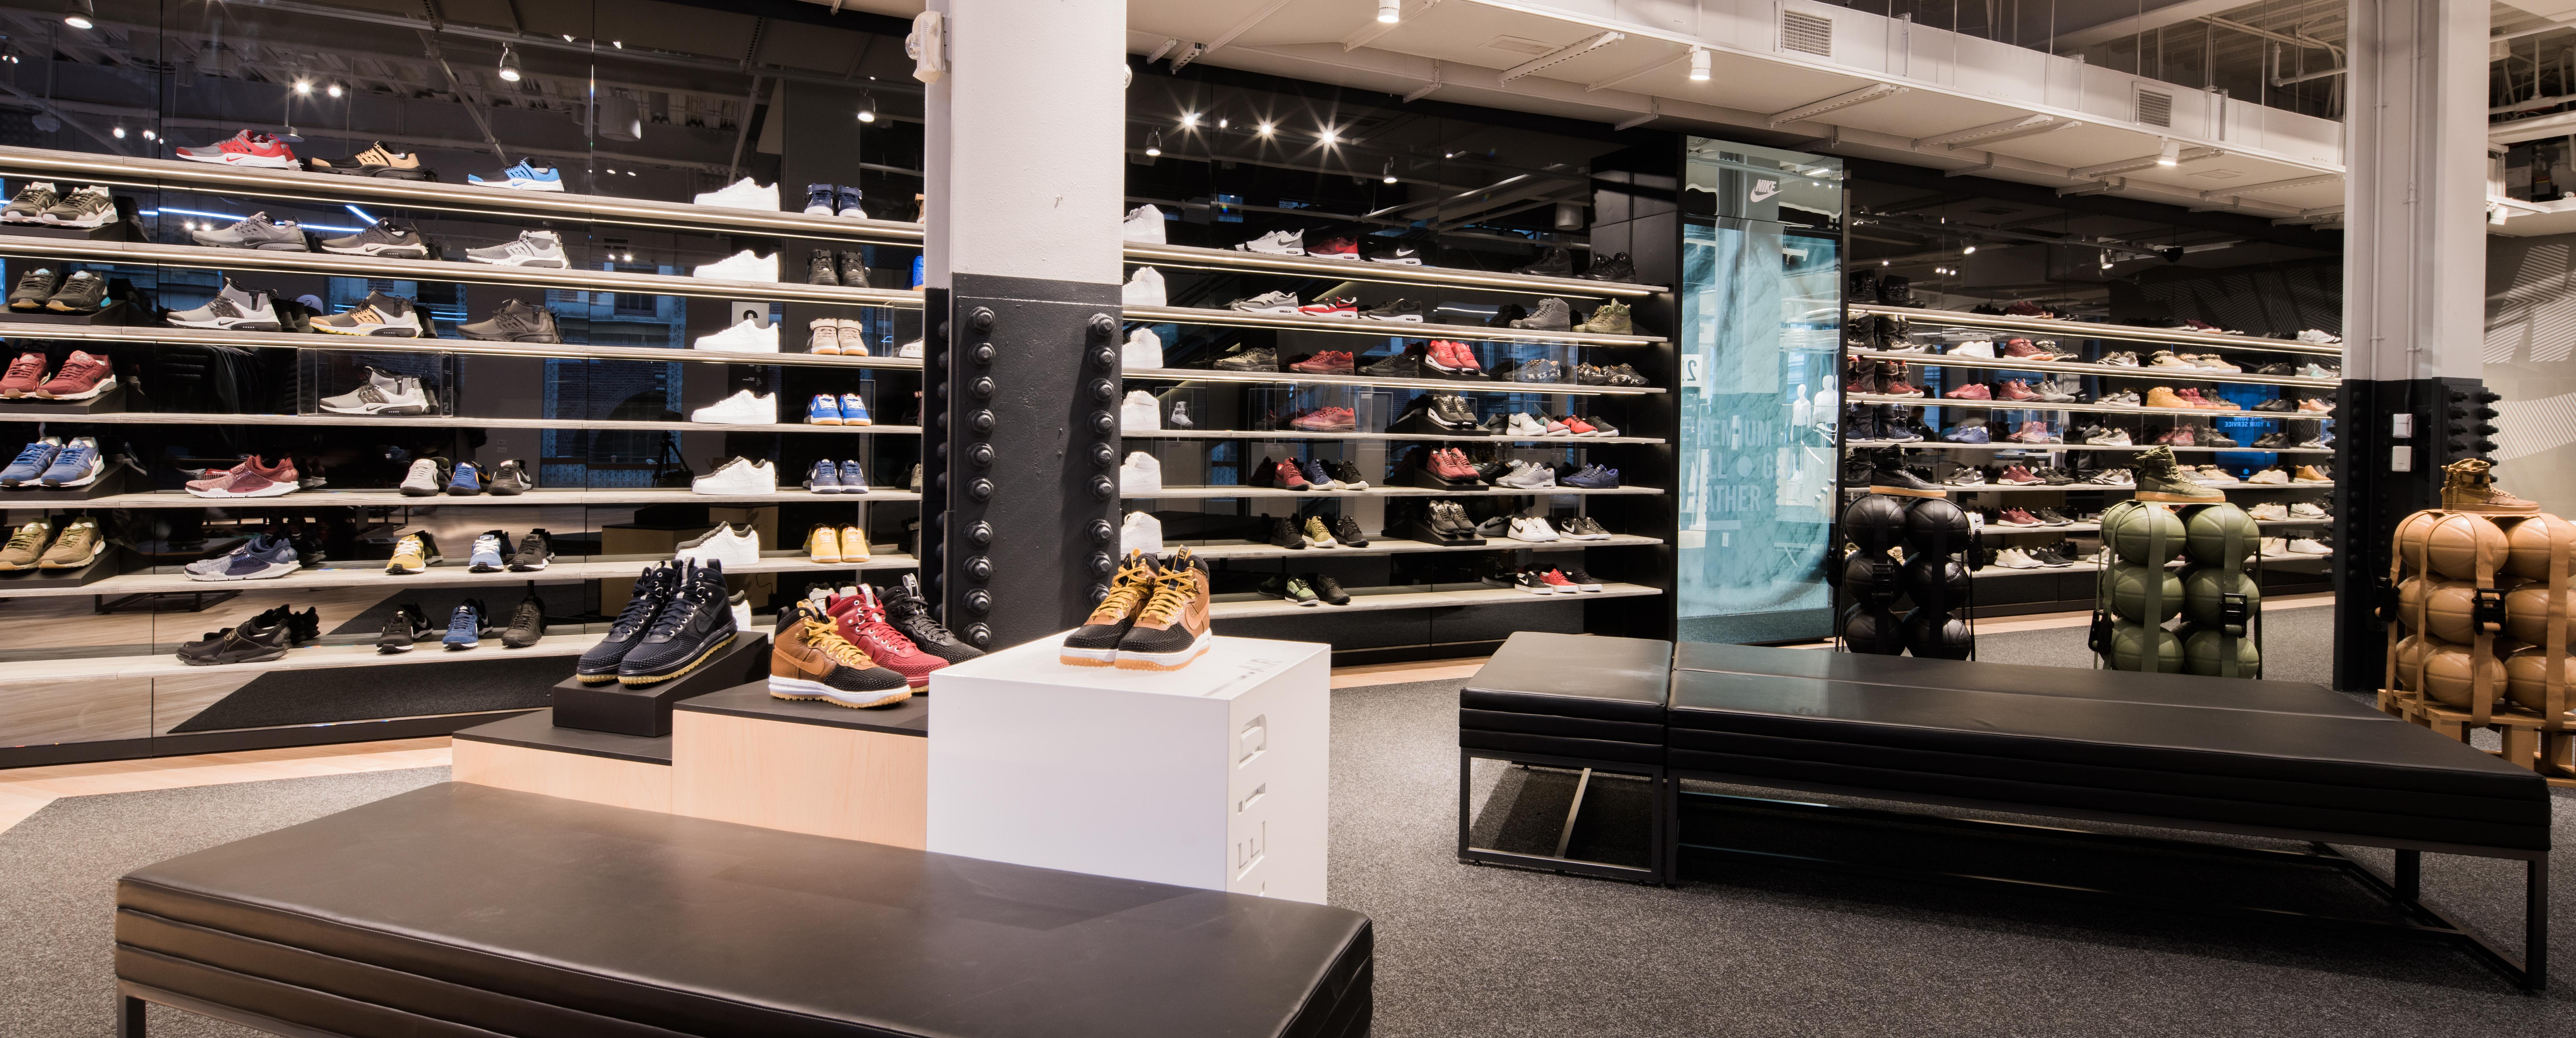 Nike's new Soho store